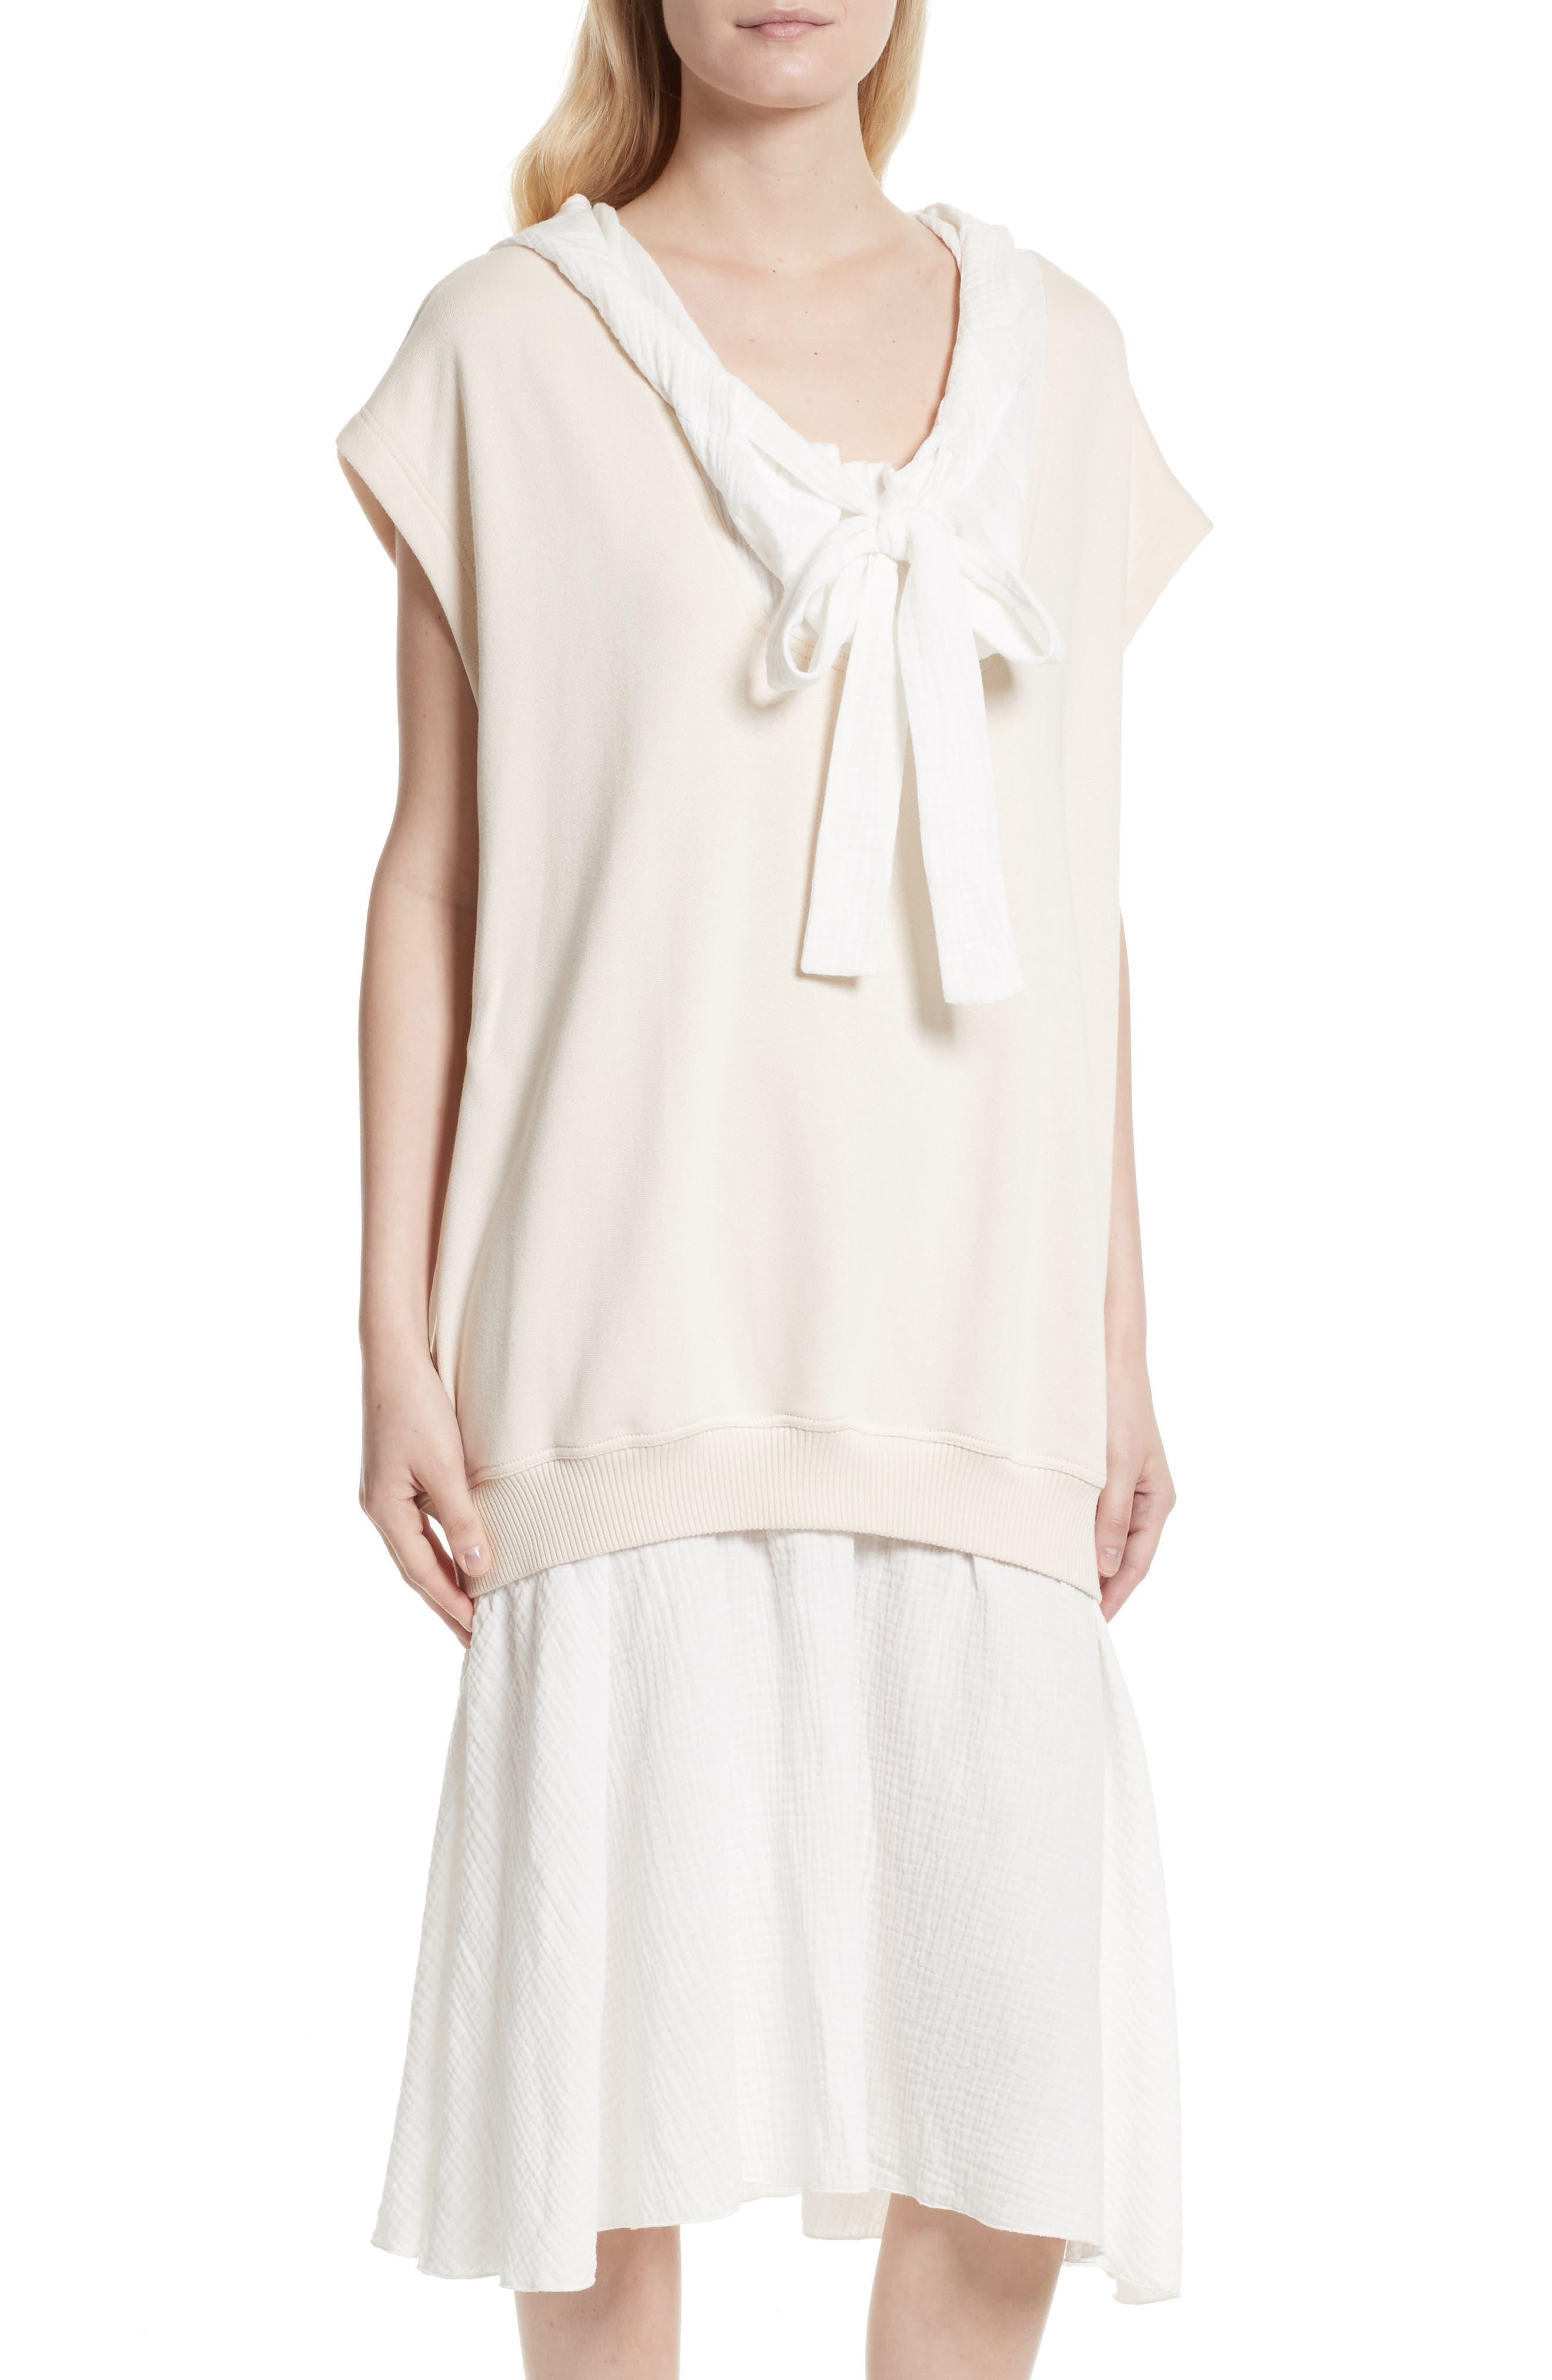 Hooded Sweatshirt Overlay Dress,                             Alternate thumbnail 4, color,                             170